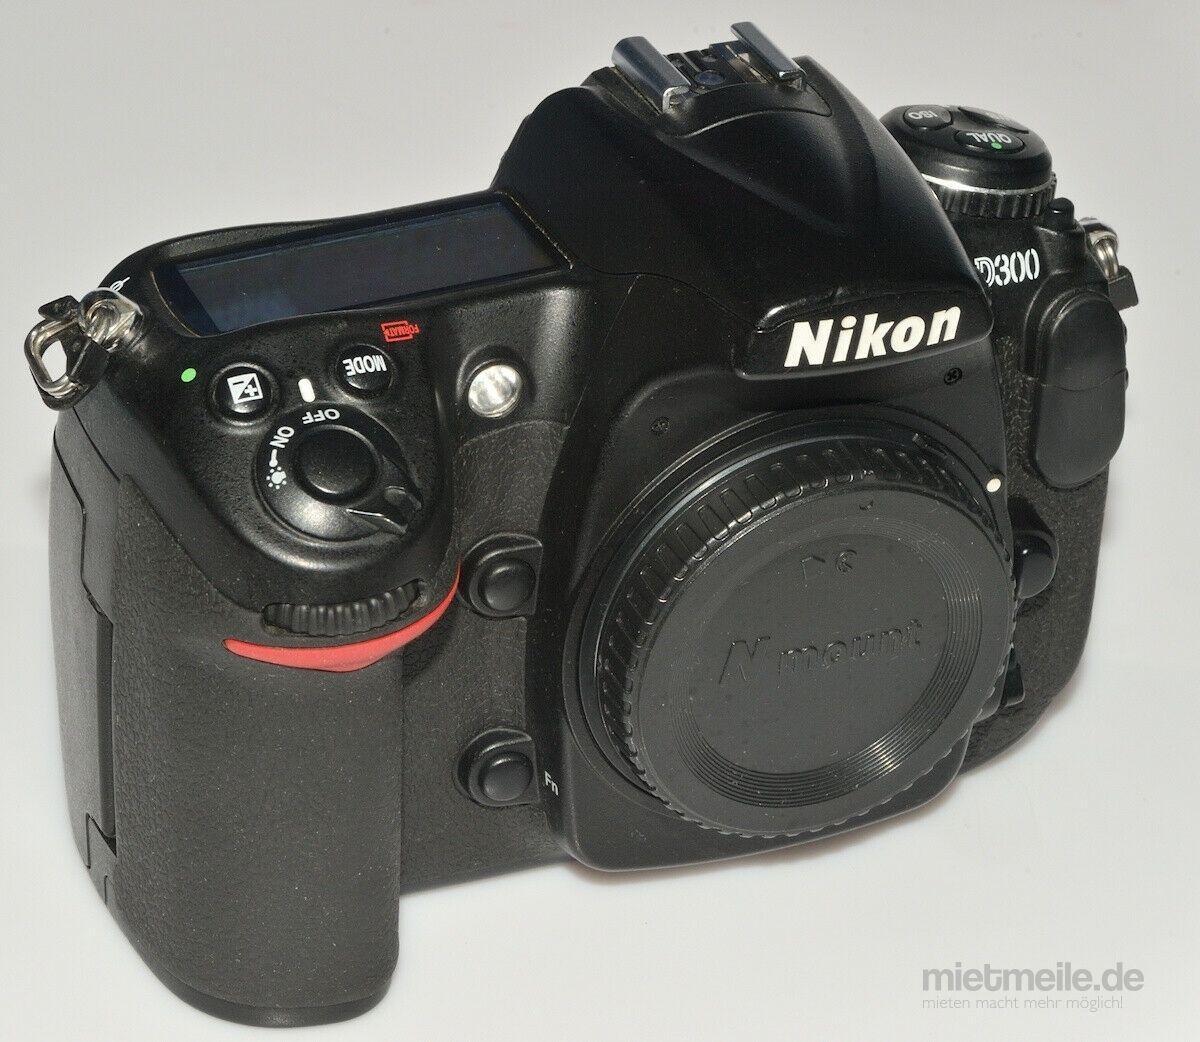 Fotokamera mieten & vermieten - Nikon D300 Kamera mit Sigma 18-200mm 3.5-5.6 Objektiv in Malgersdorf